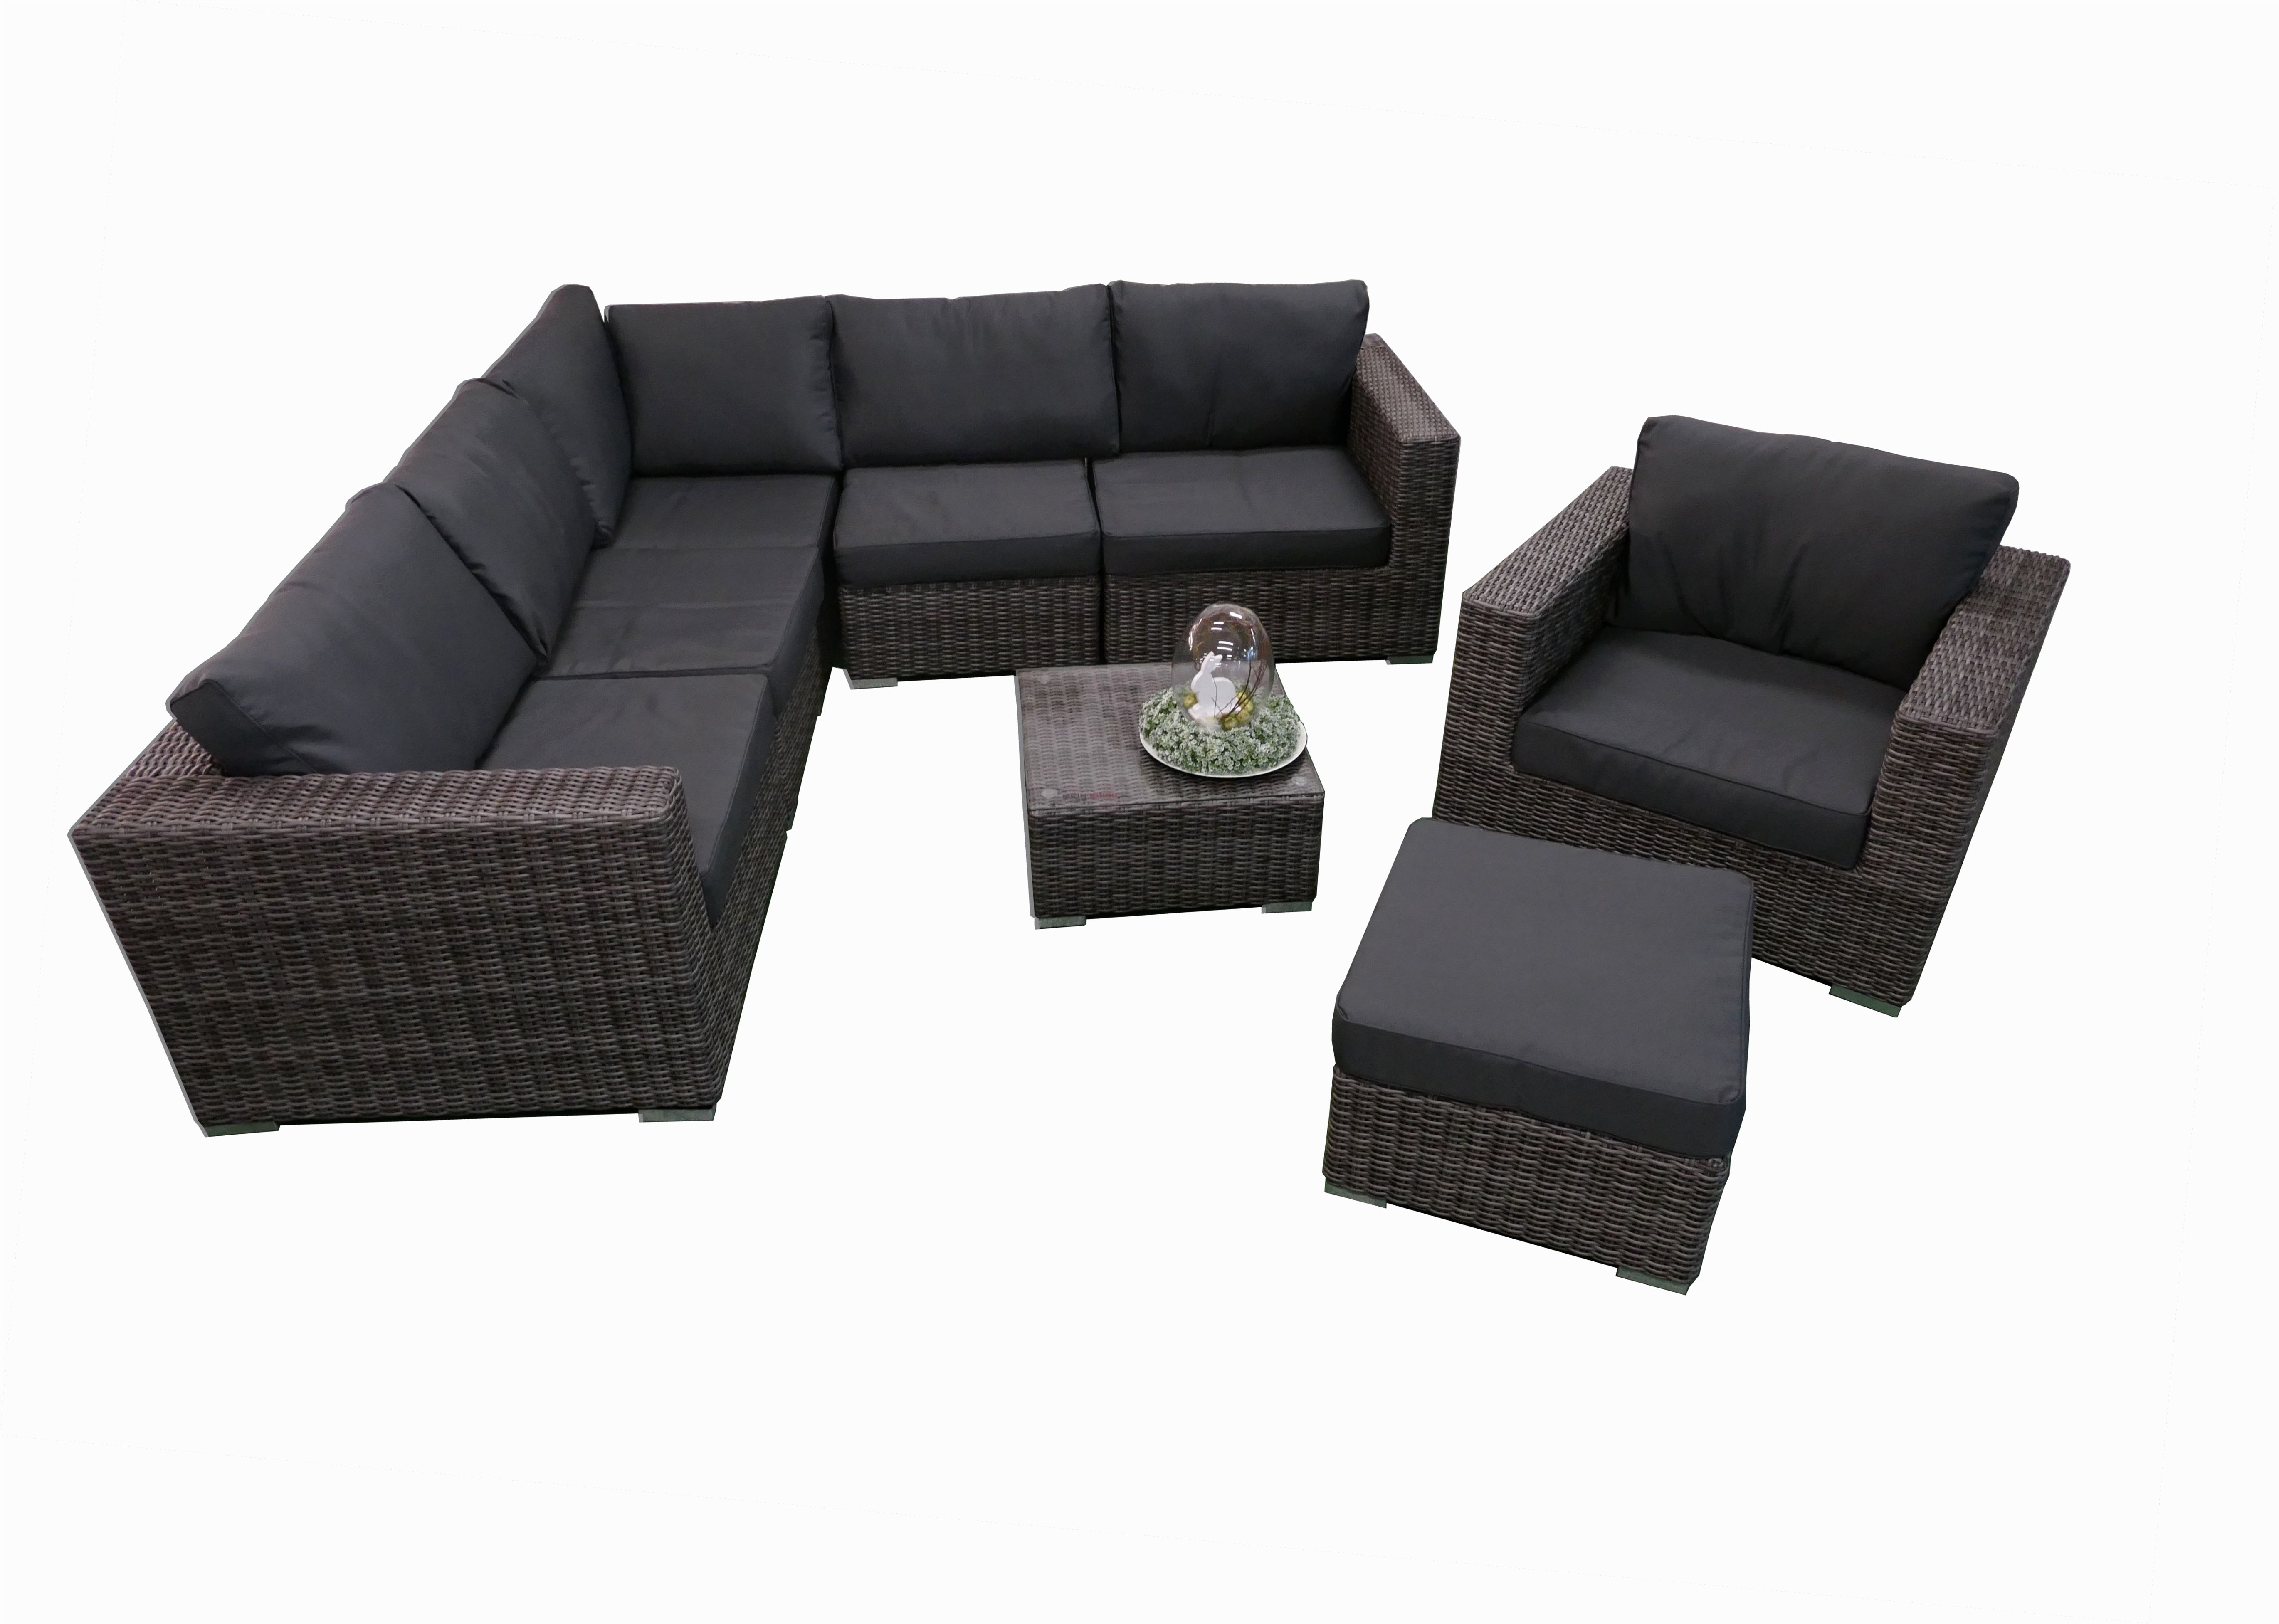 Outdoor Table and Chairs at Walmart Elegant Walmart Outdoor Furniture Livingpositivebydesign Com